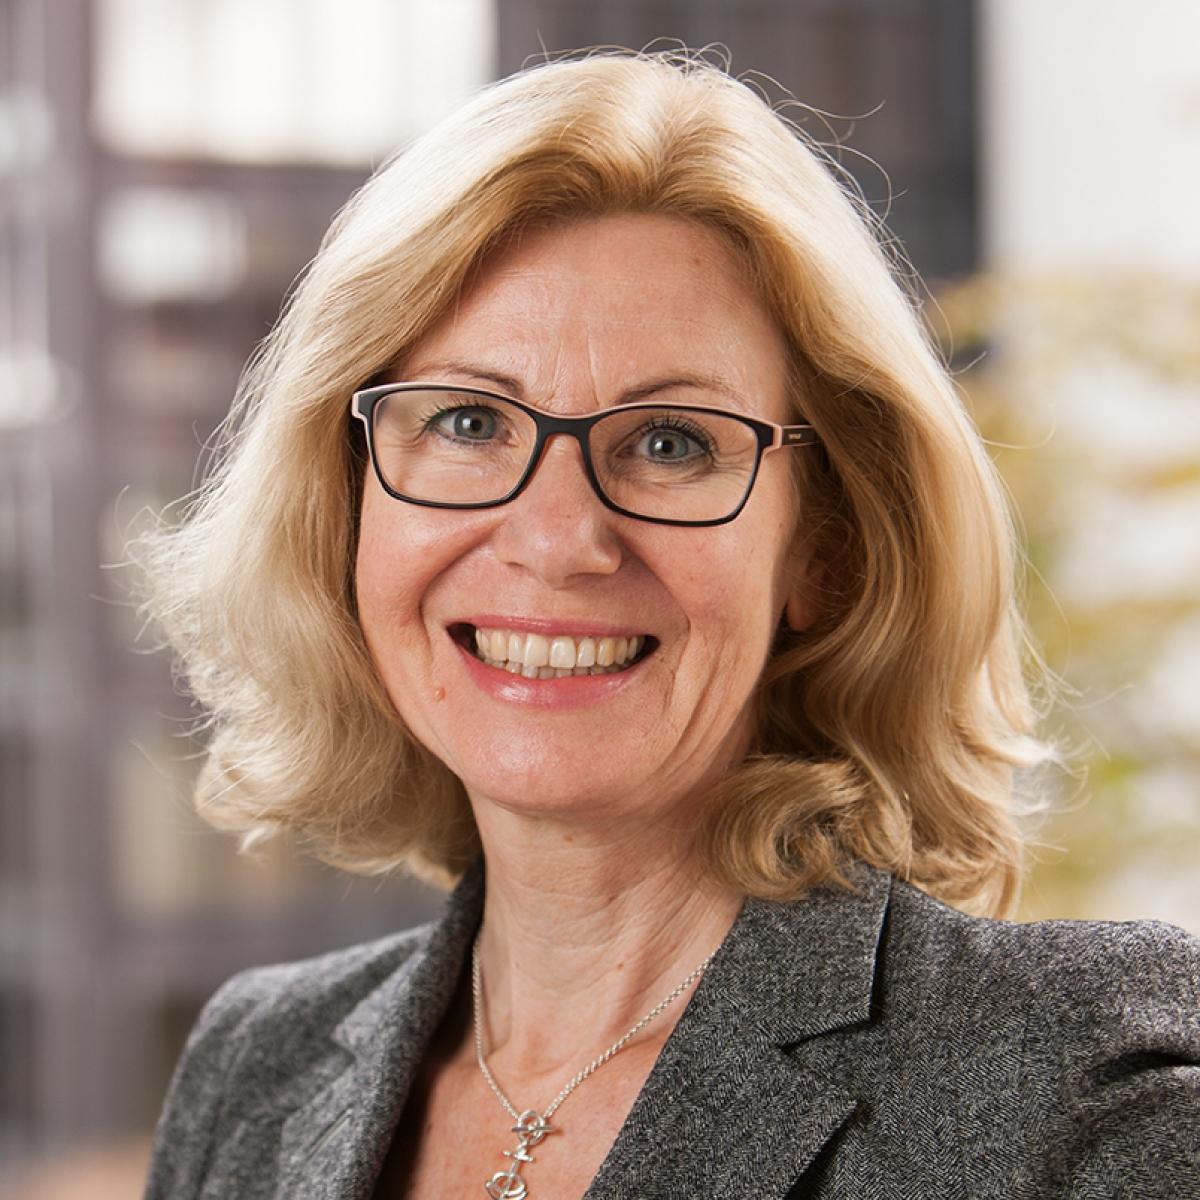 Sabine Seedorf-Althen